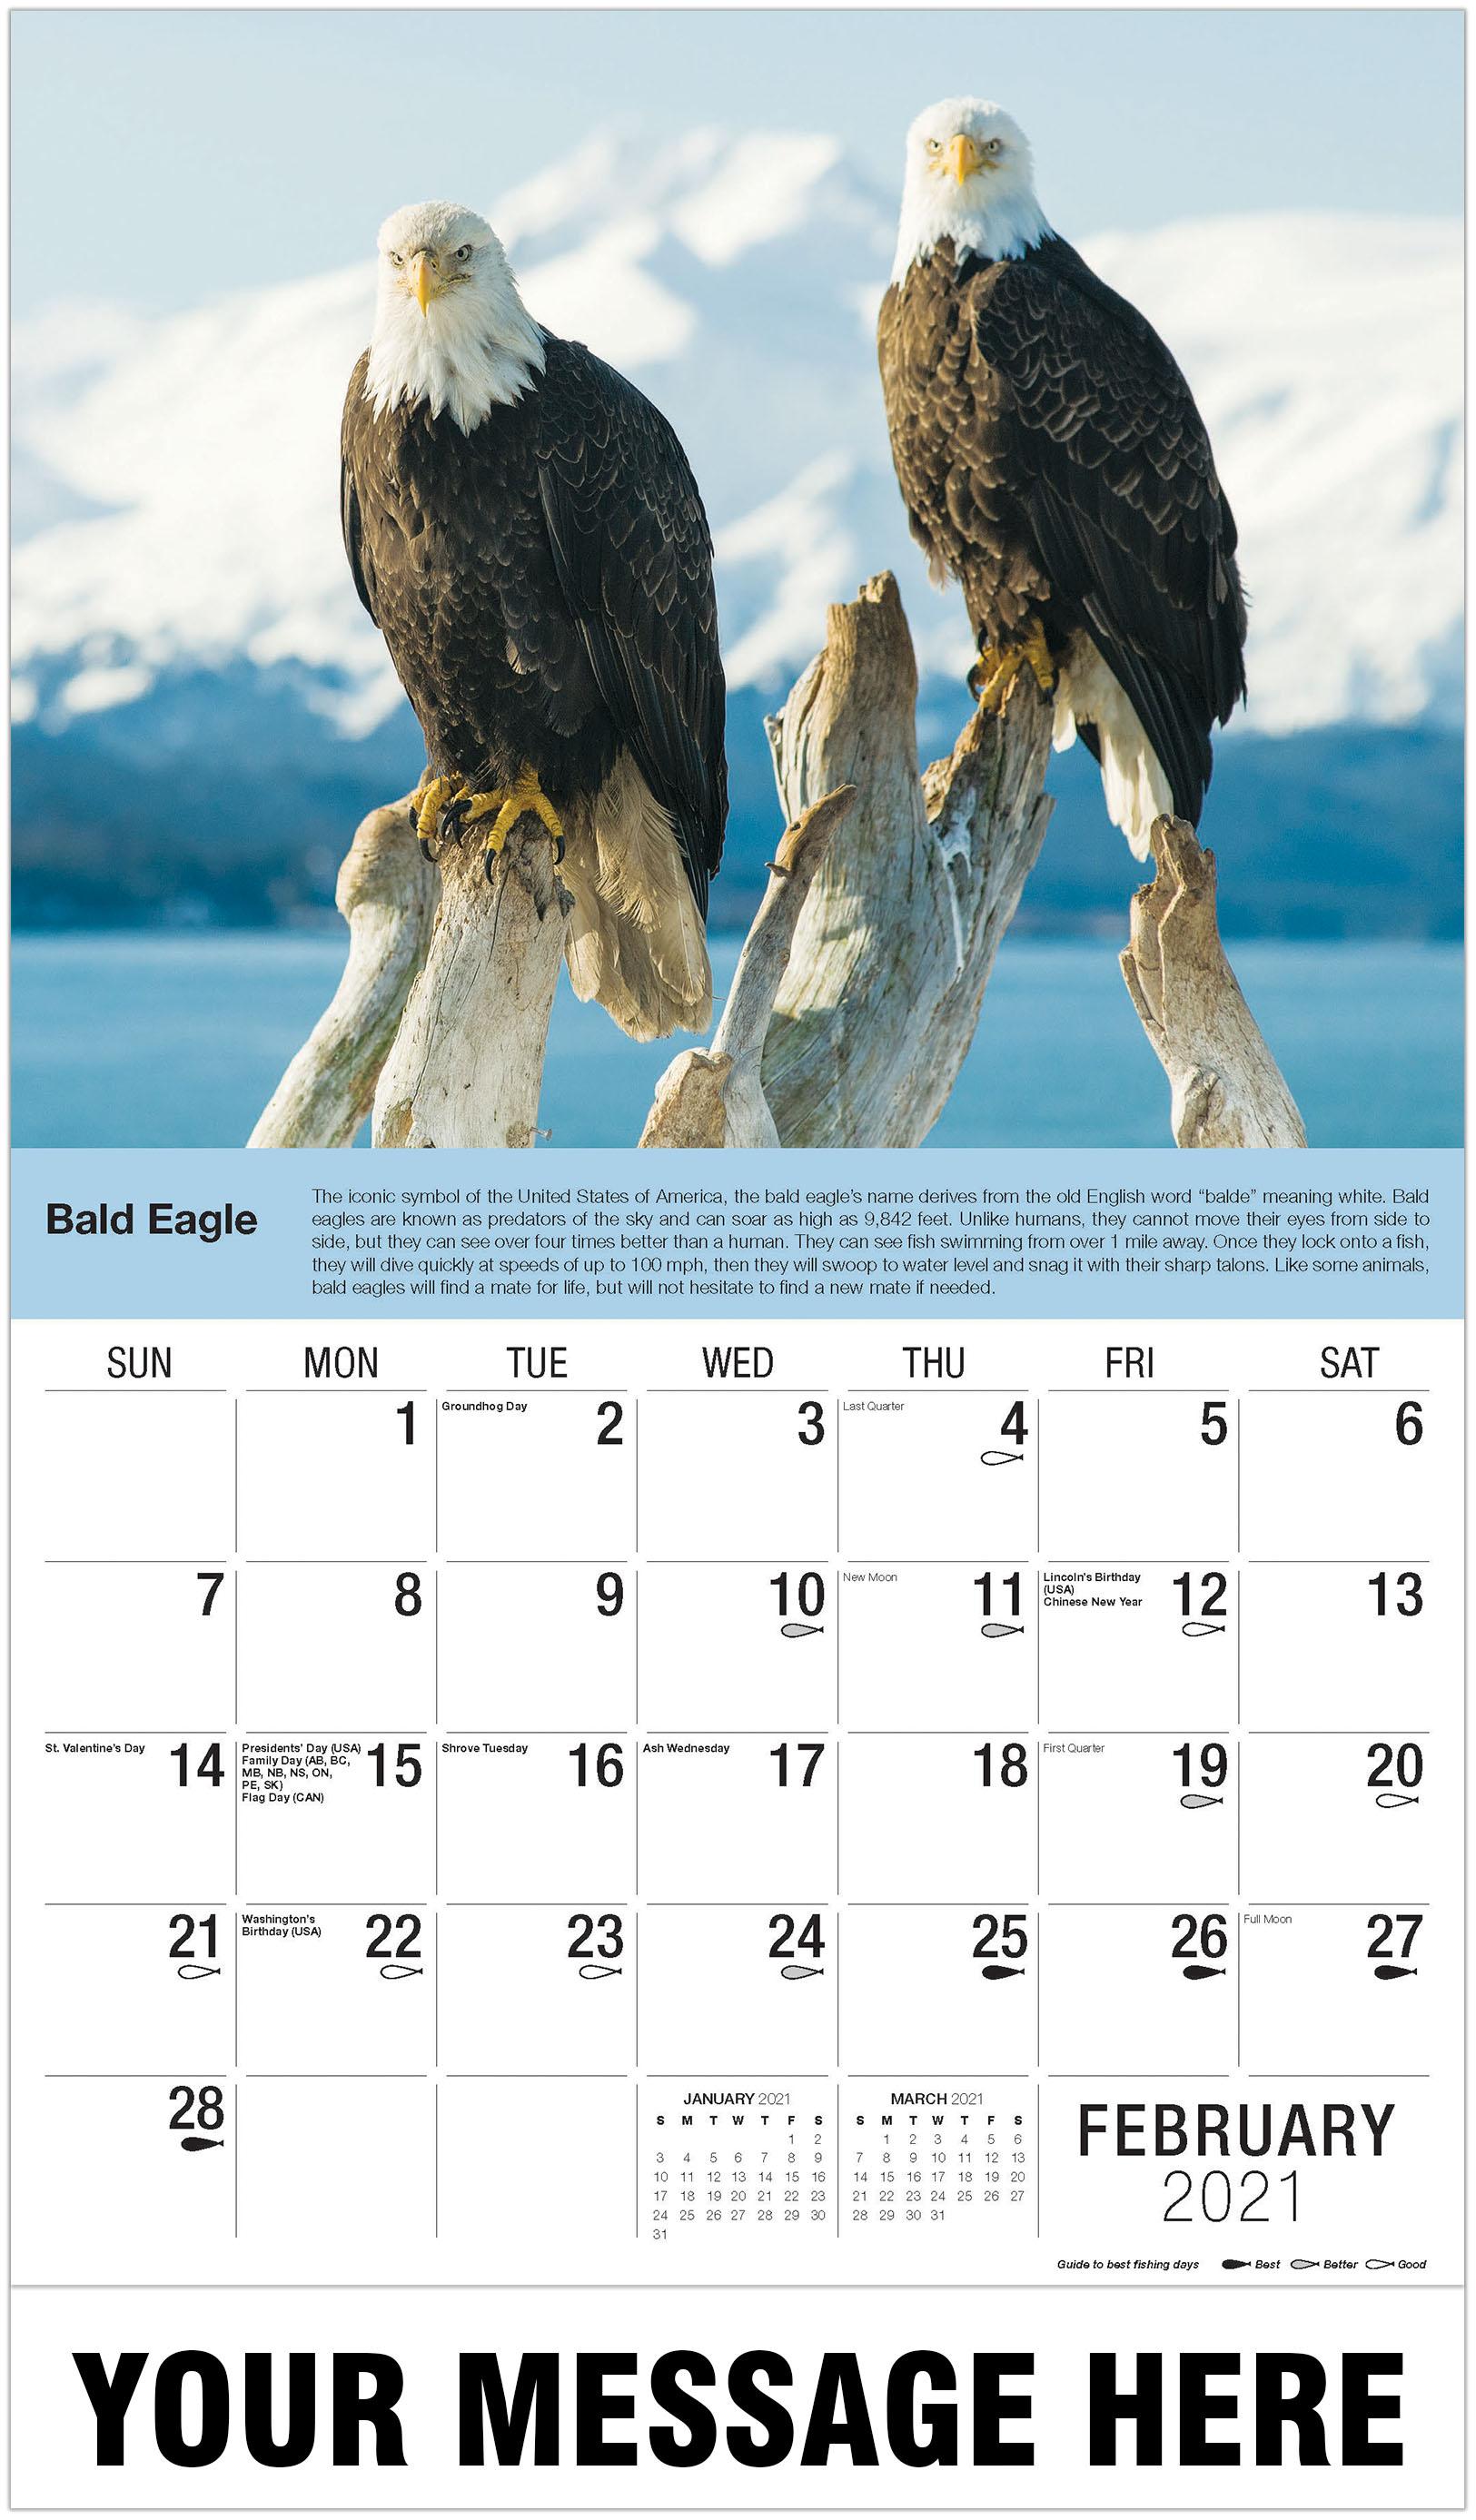 Bald Eagle - February - North American Wildlife 2021 Promotional Calendar